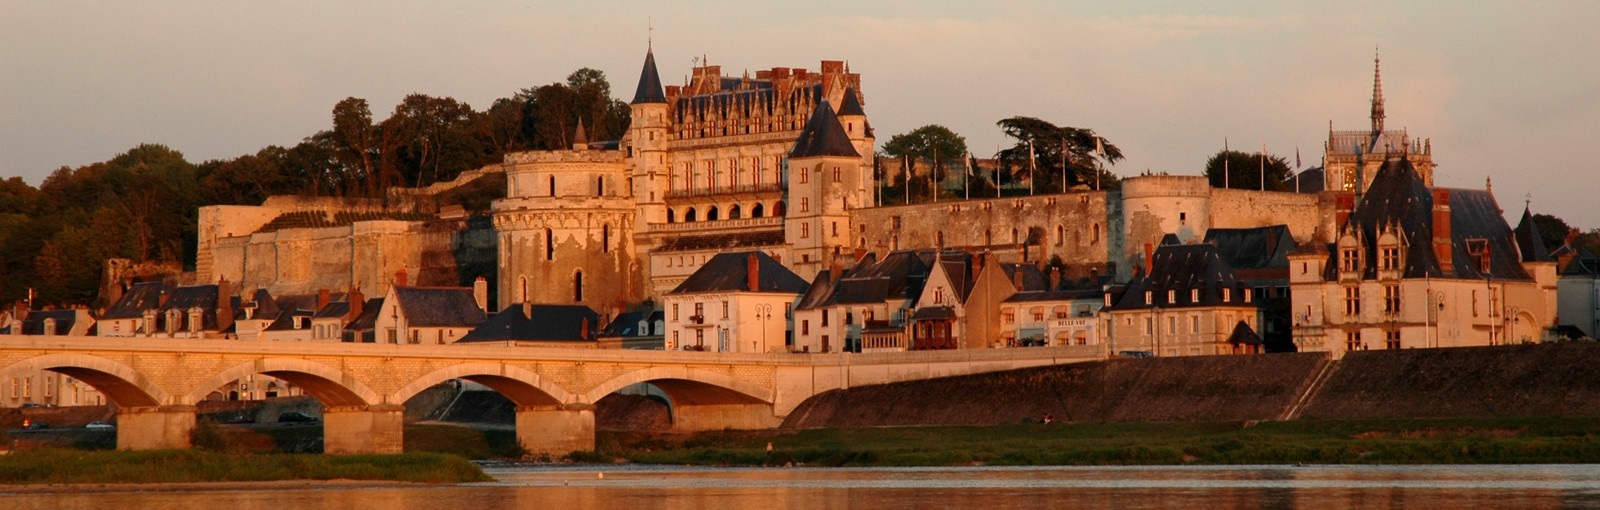 Tours 达芬奇和昂布瓦兹的葡萄酒 - 一日游 - 从巴黎出发的一日游